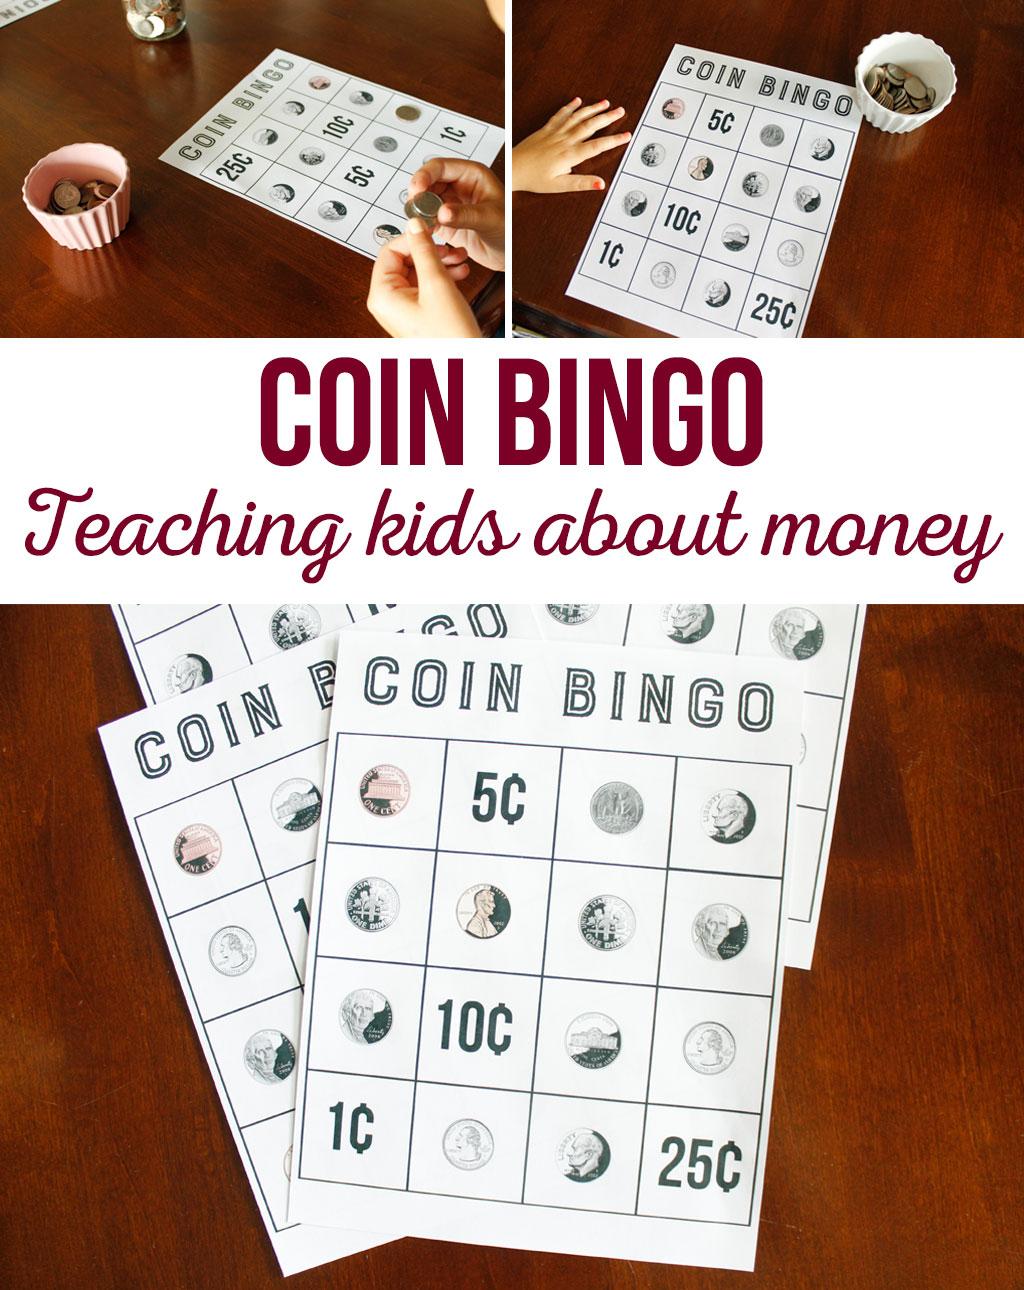 Coin Bingo Free Printable - The Crafting Chicks - Free Printable Game Money